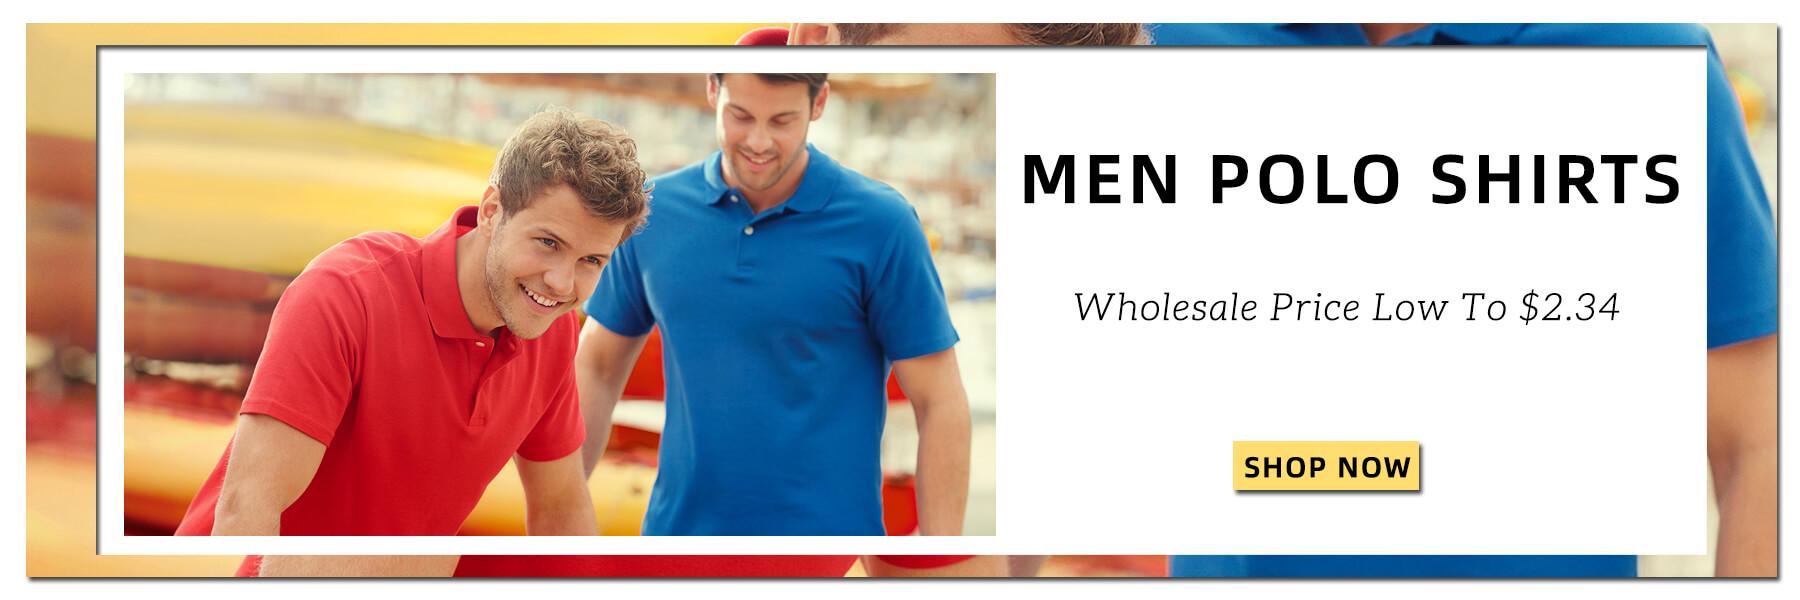 Wholesale Men Polo Shirts